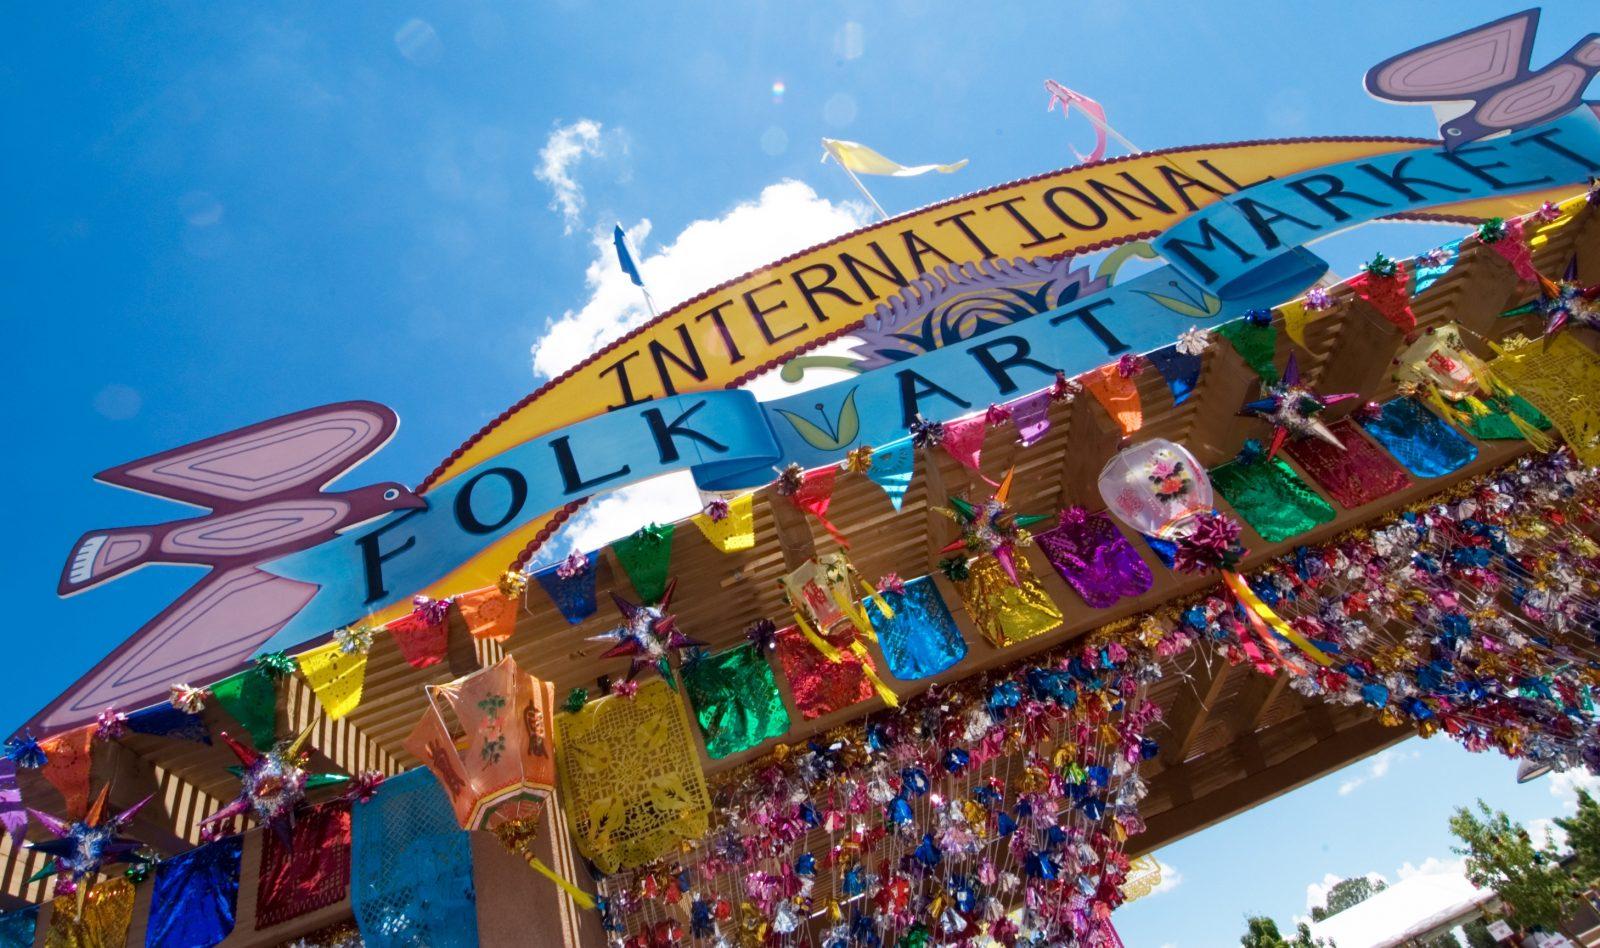 Image credit: Santa Fe International Folk Art Market